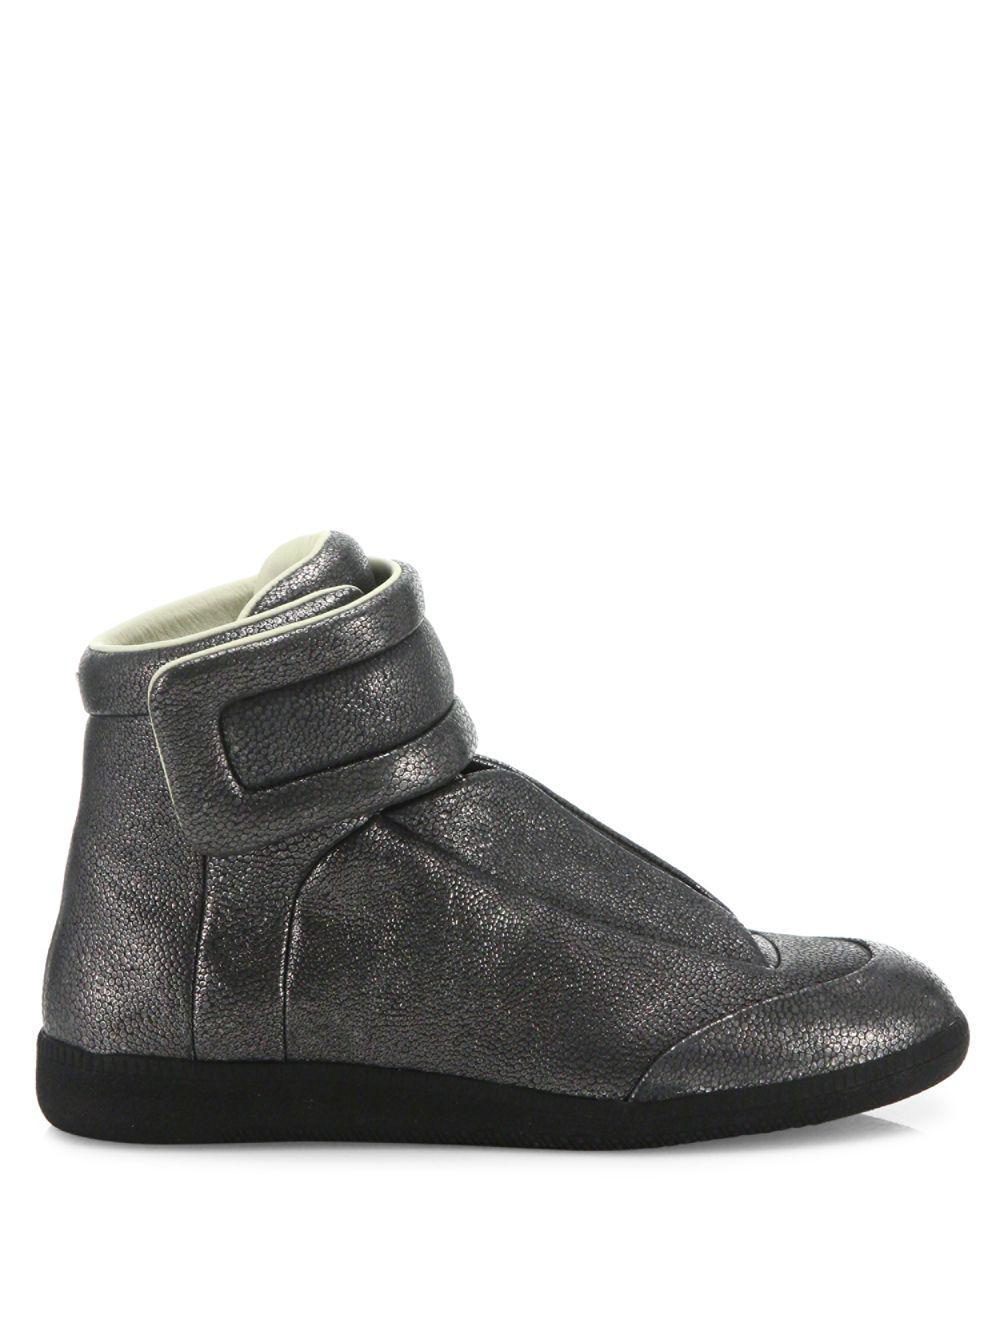 7783b8e12e1fc Lyst - Maison Margiela Stingray Future Leather High-top Sneakers in Gray  for Men